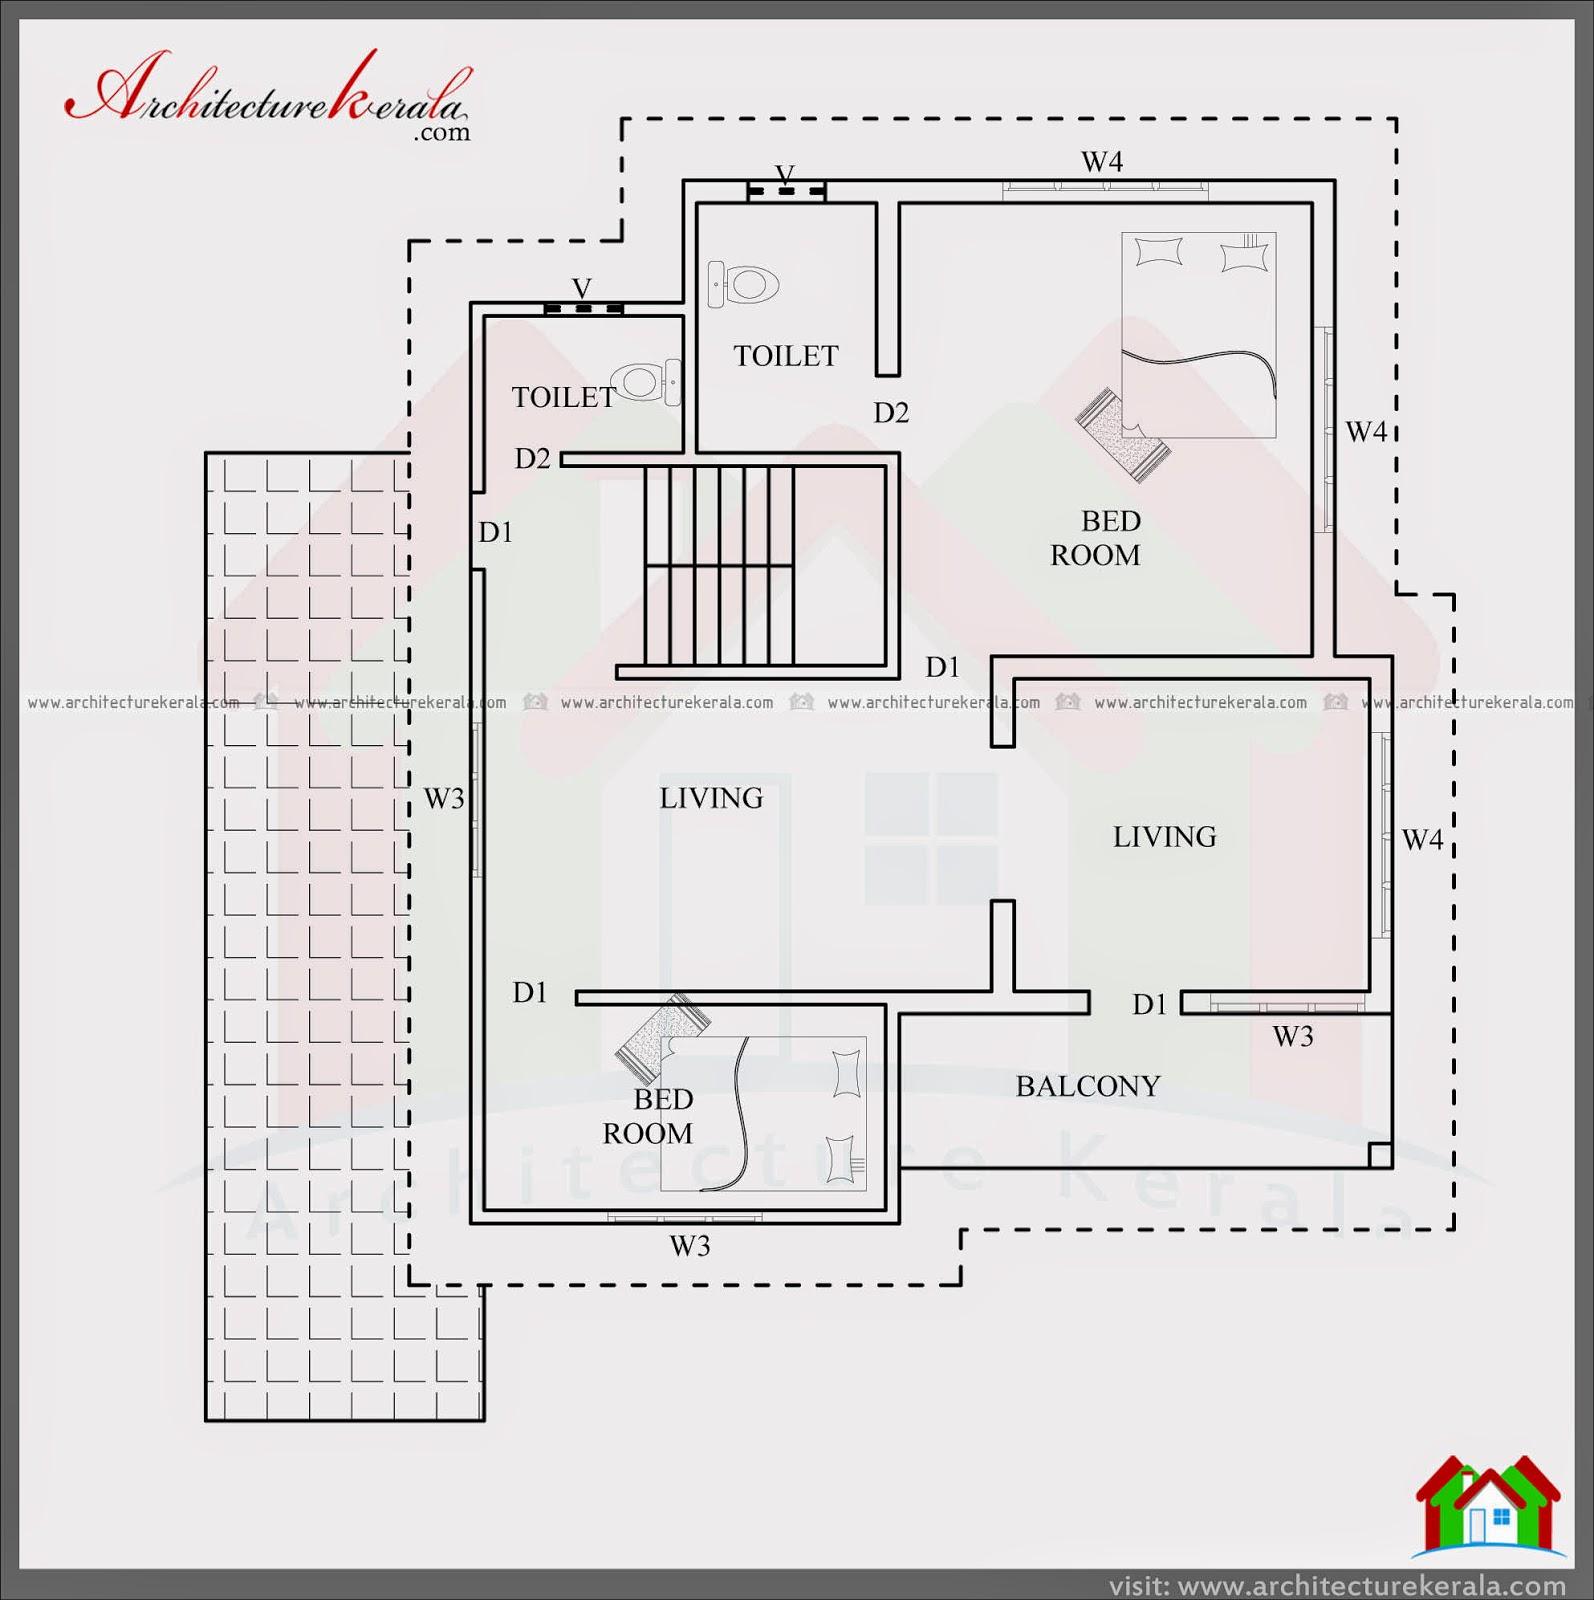 architecturekerala.com